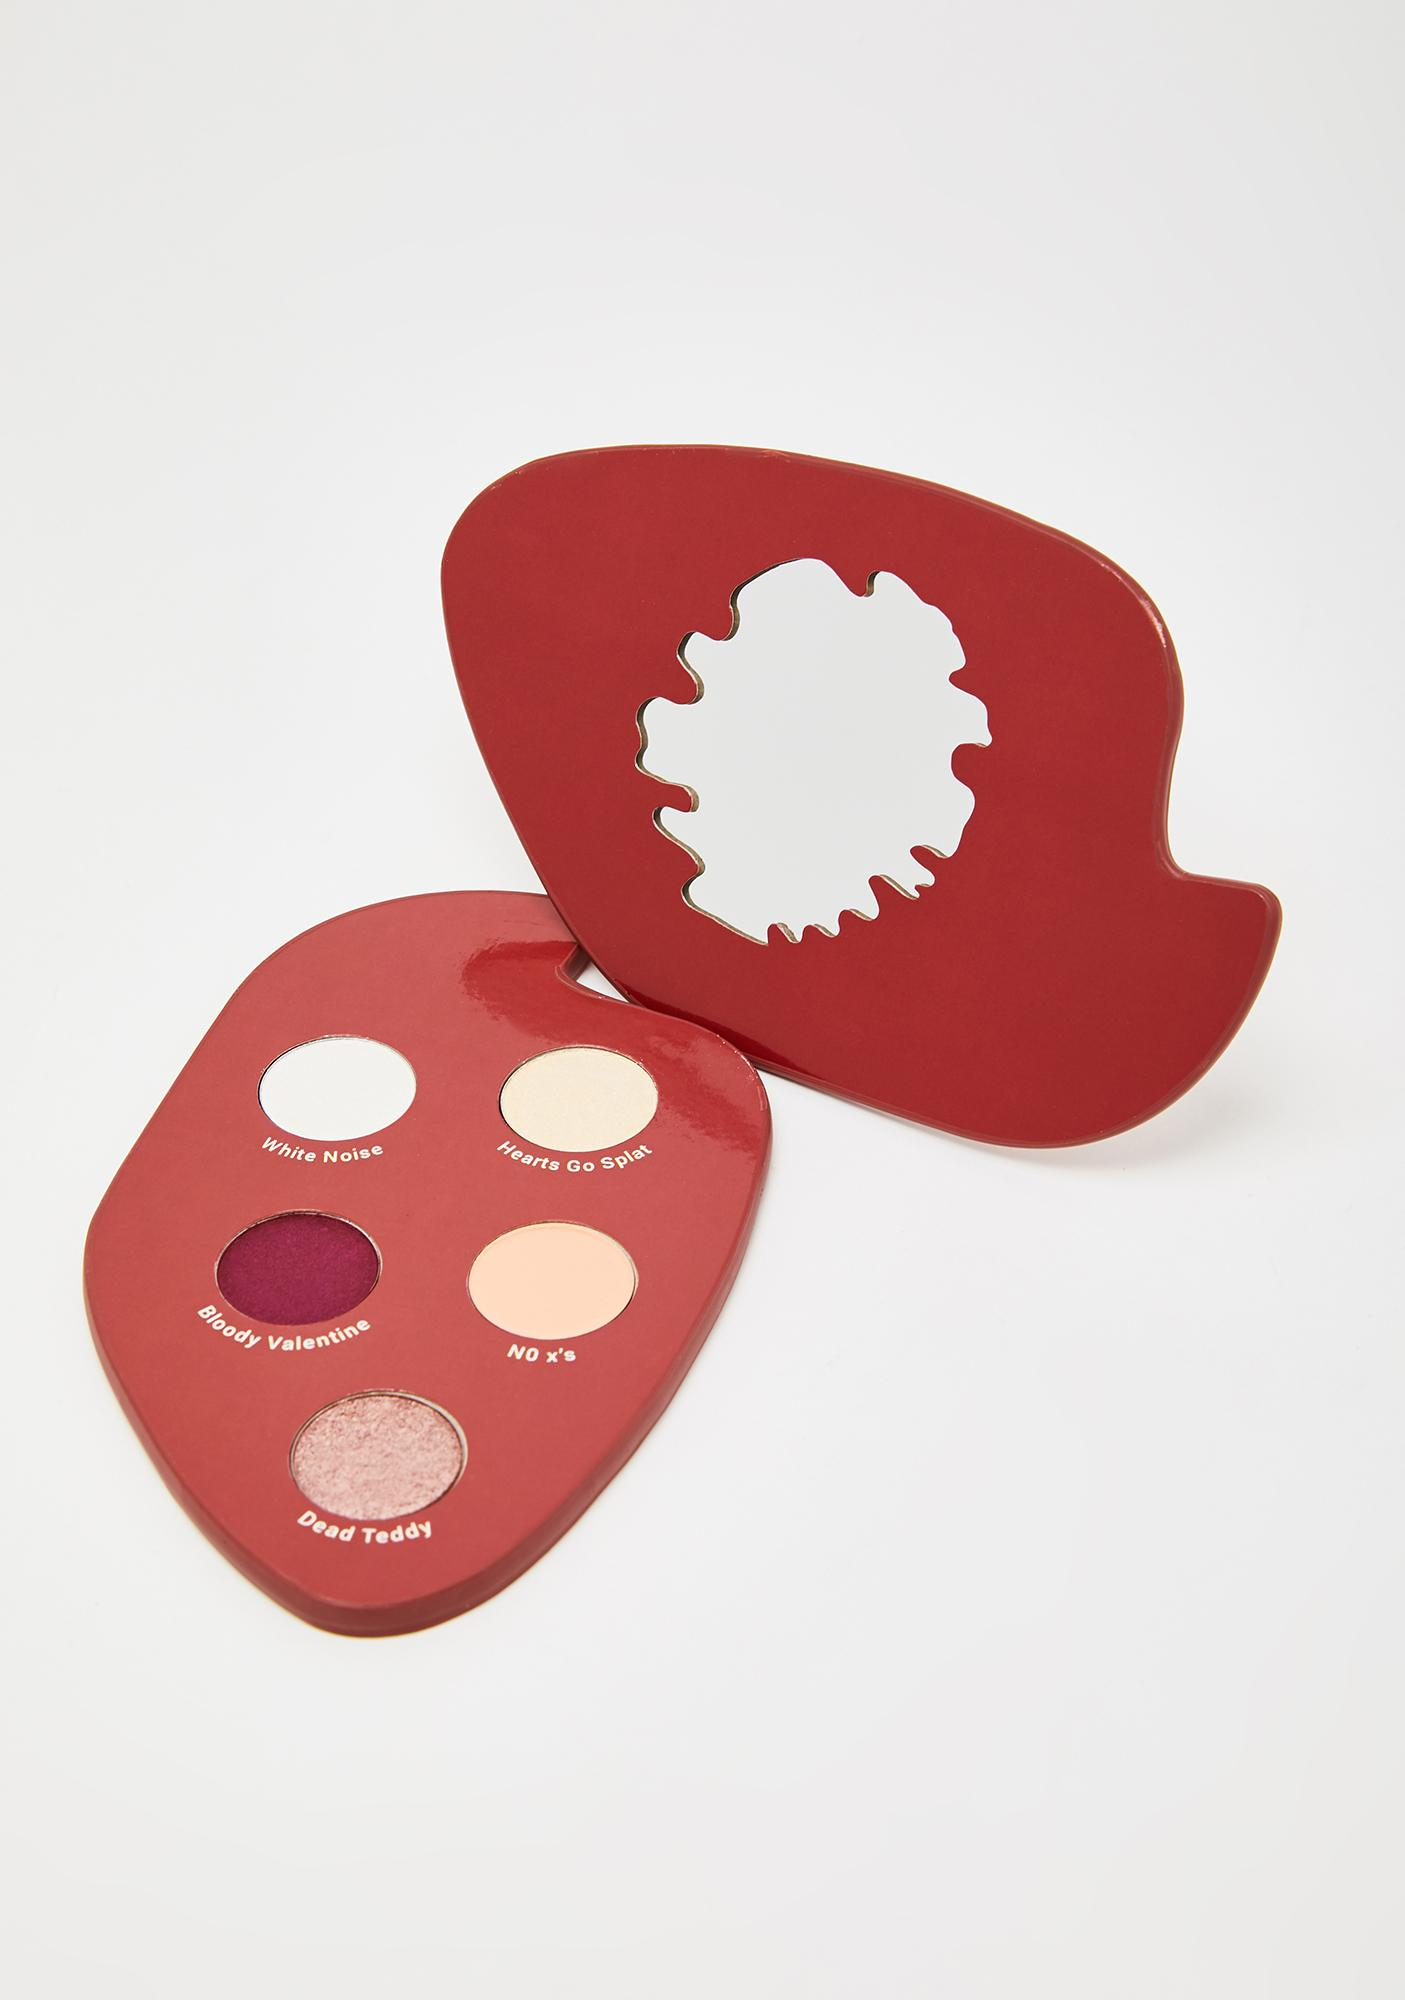 Lunatick Cosmetic Labs Take My Heart Eyeshadow Palette